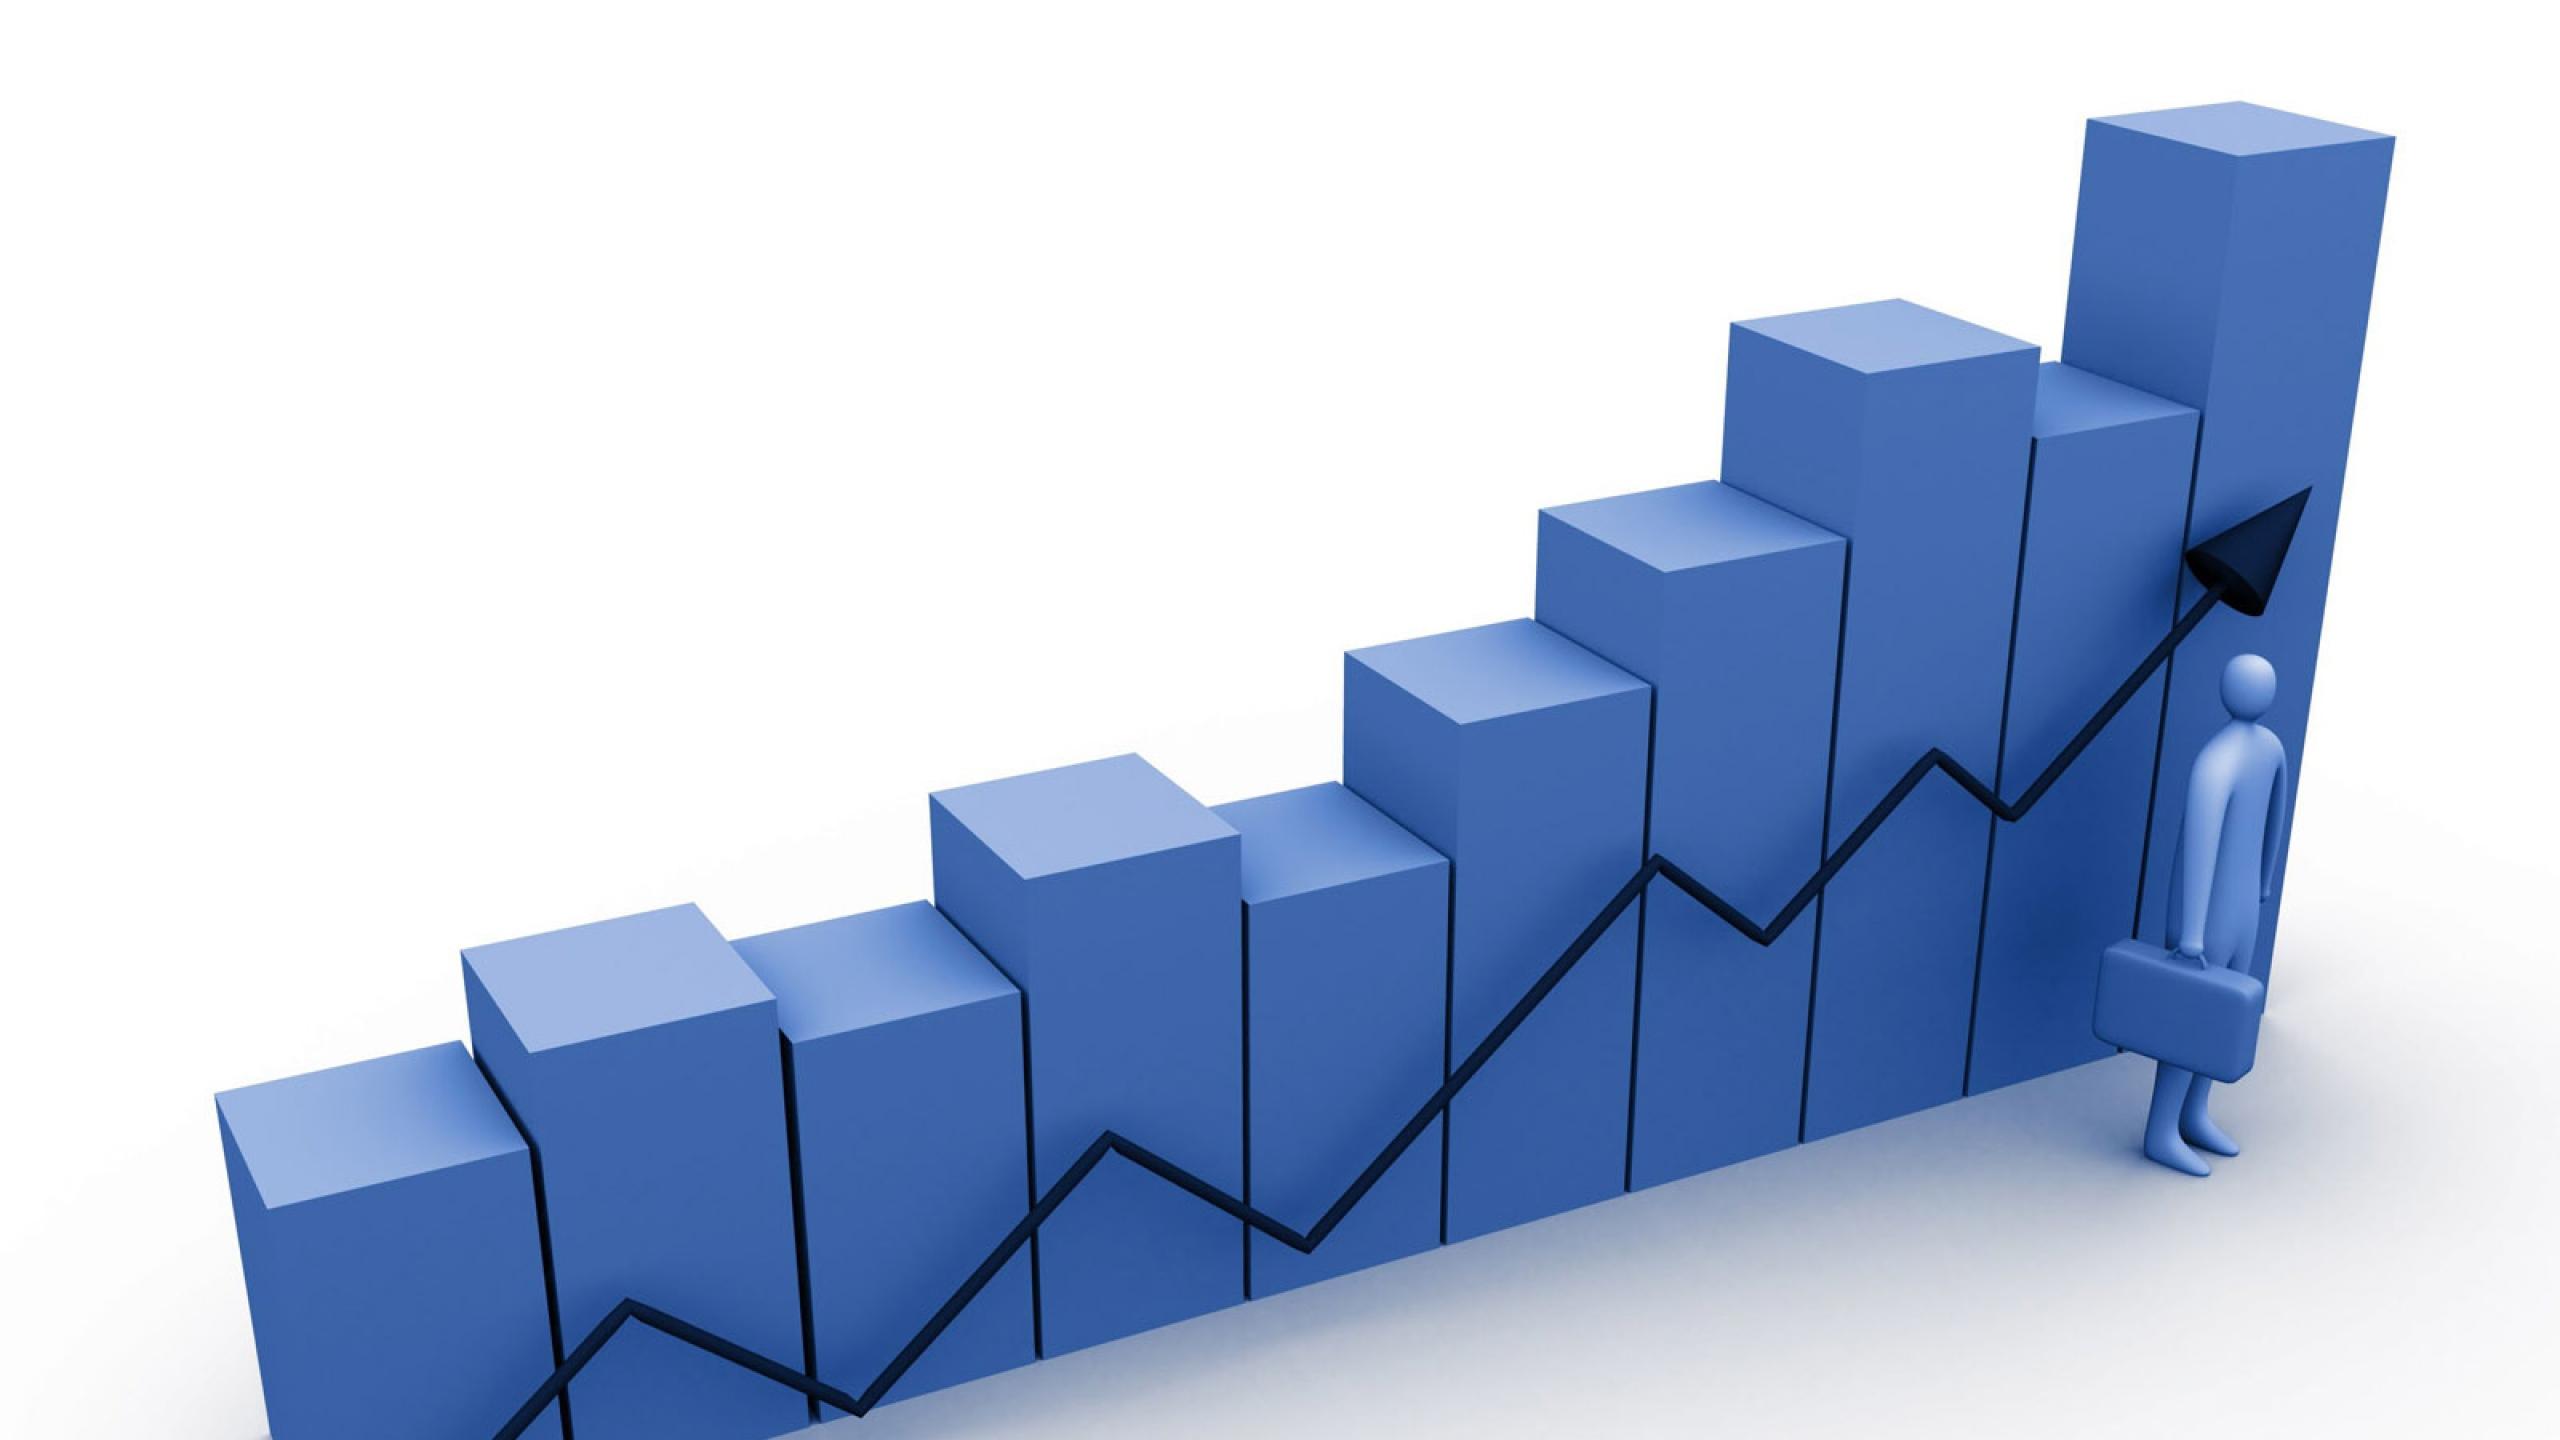 Graph clipart business growth Growth Clipart Clipart Chart Chart